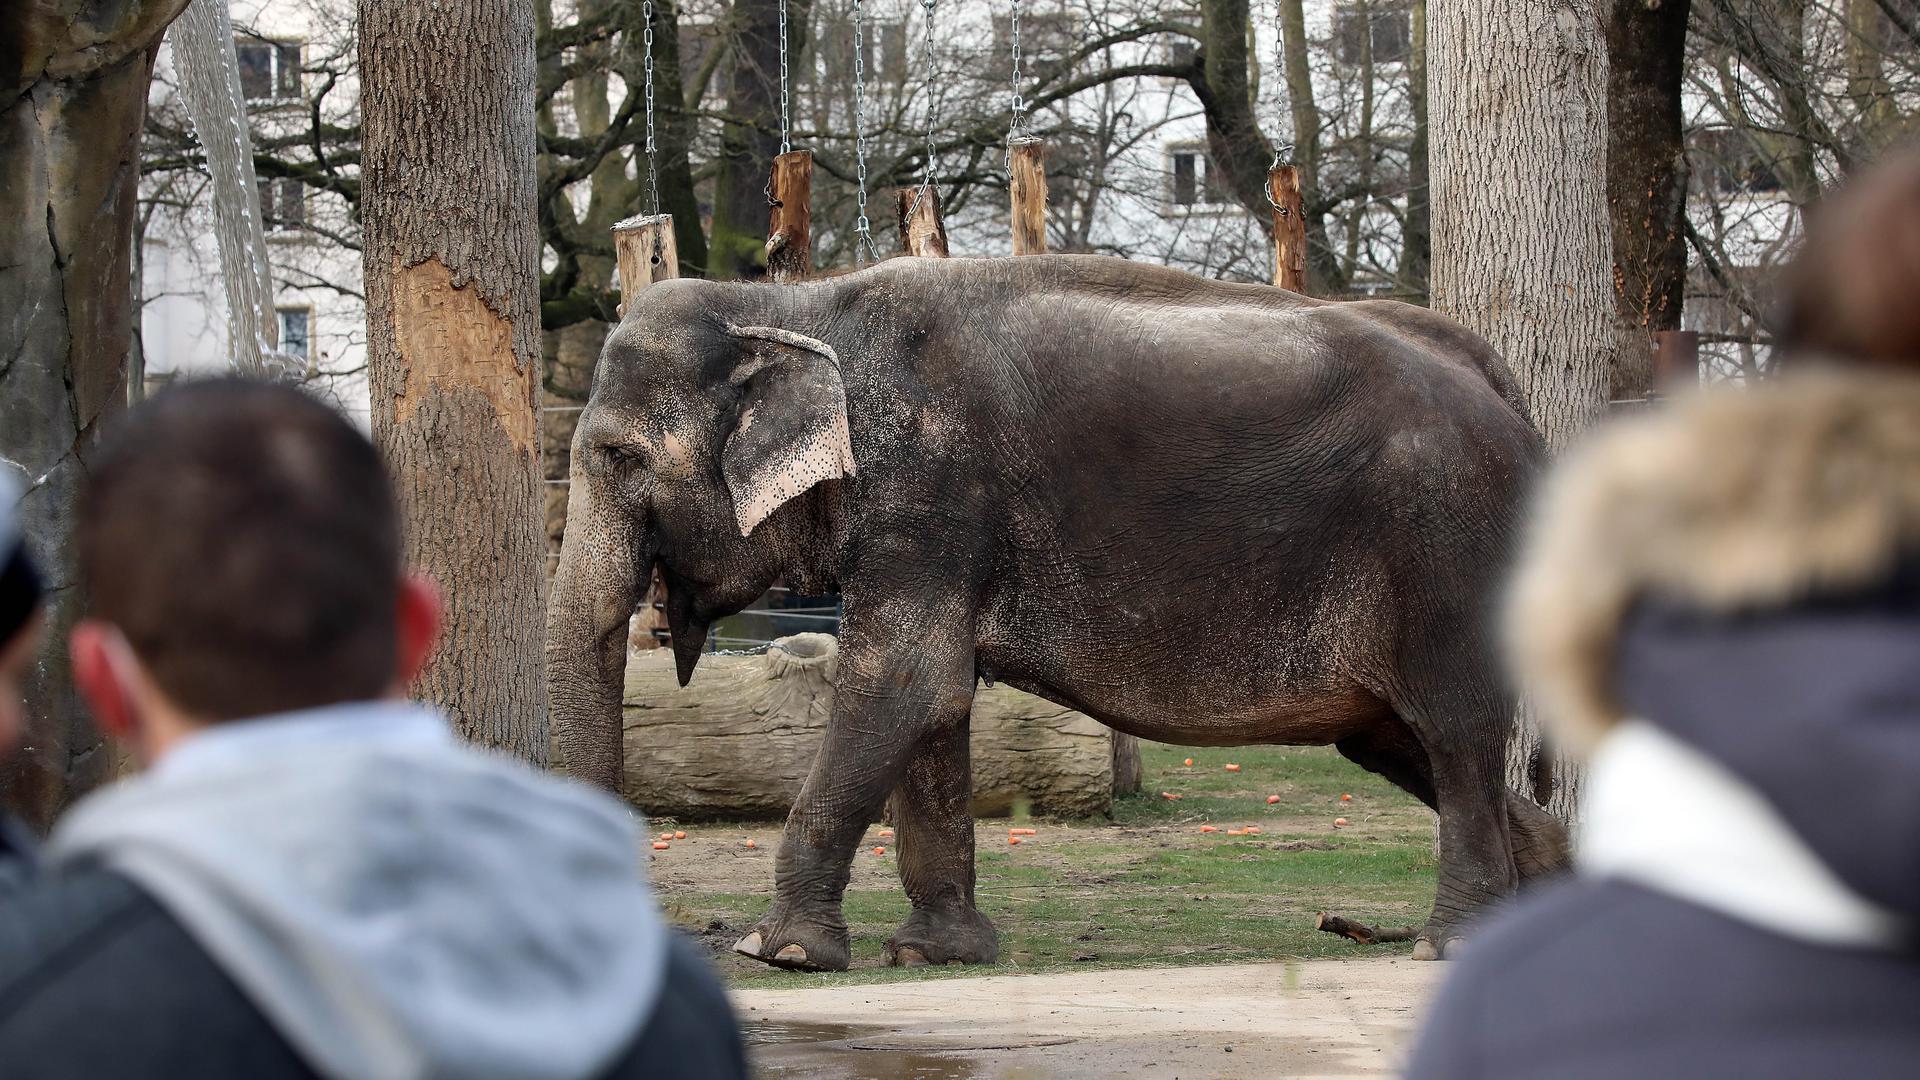 Elefantendame Nanda im Zoo.